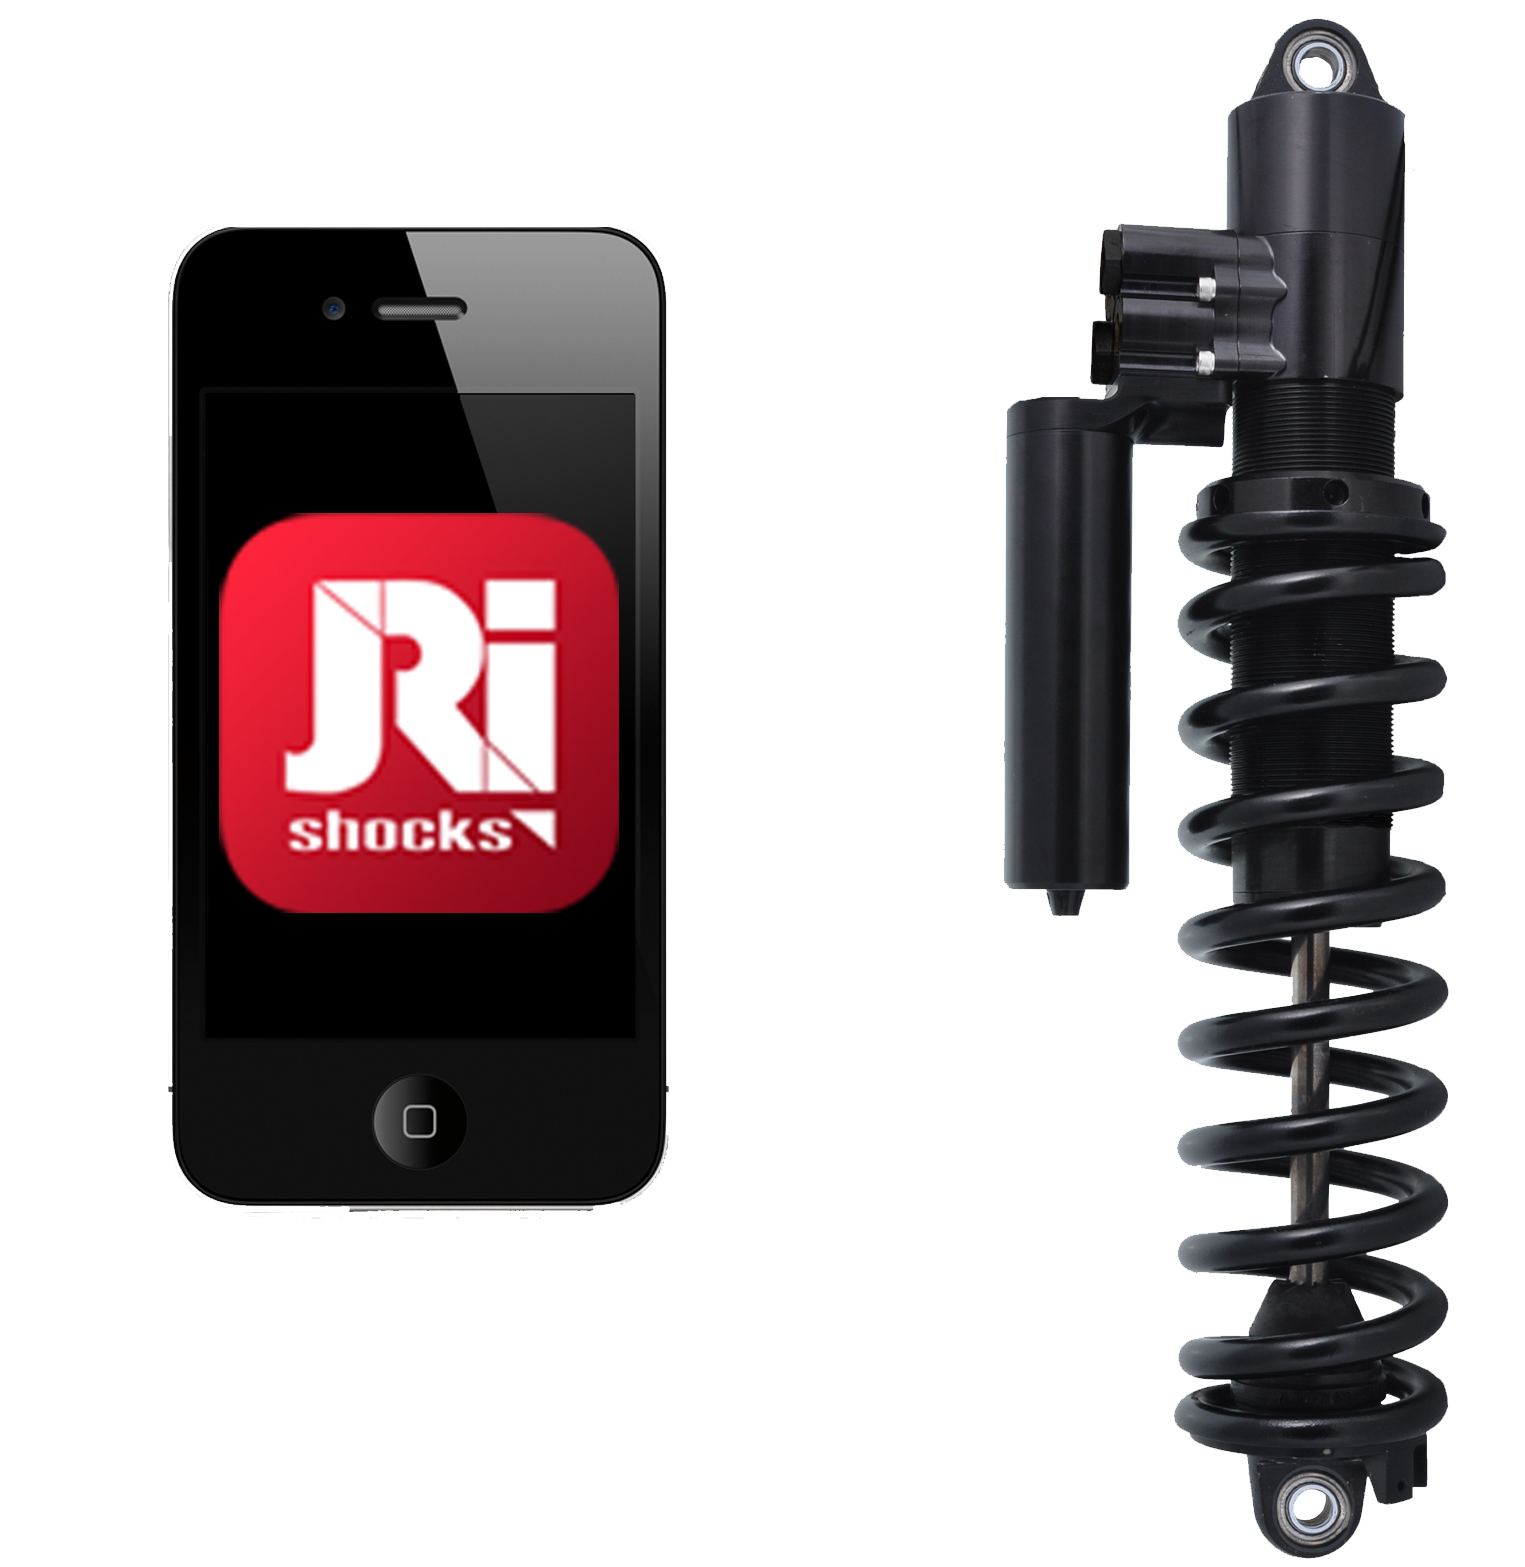 VIDEO: JRi Shocks Smart Phone Adjustable Shock System